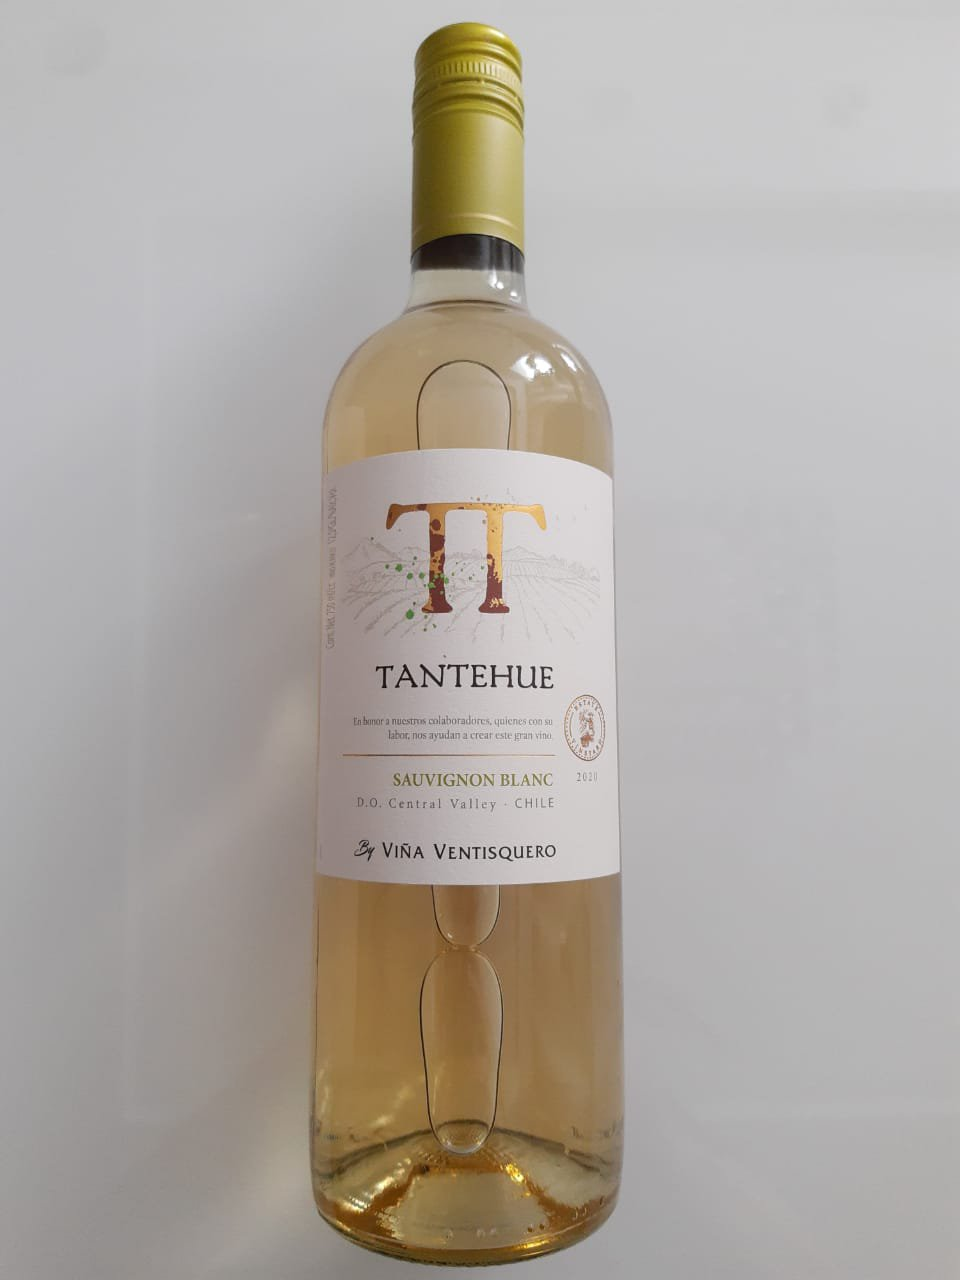 Vinho Ventisquero Tantehue Sauvignon Blanc 750ml